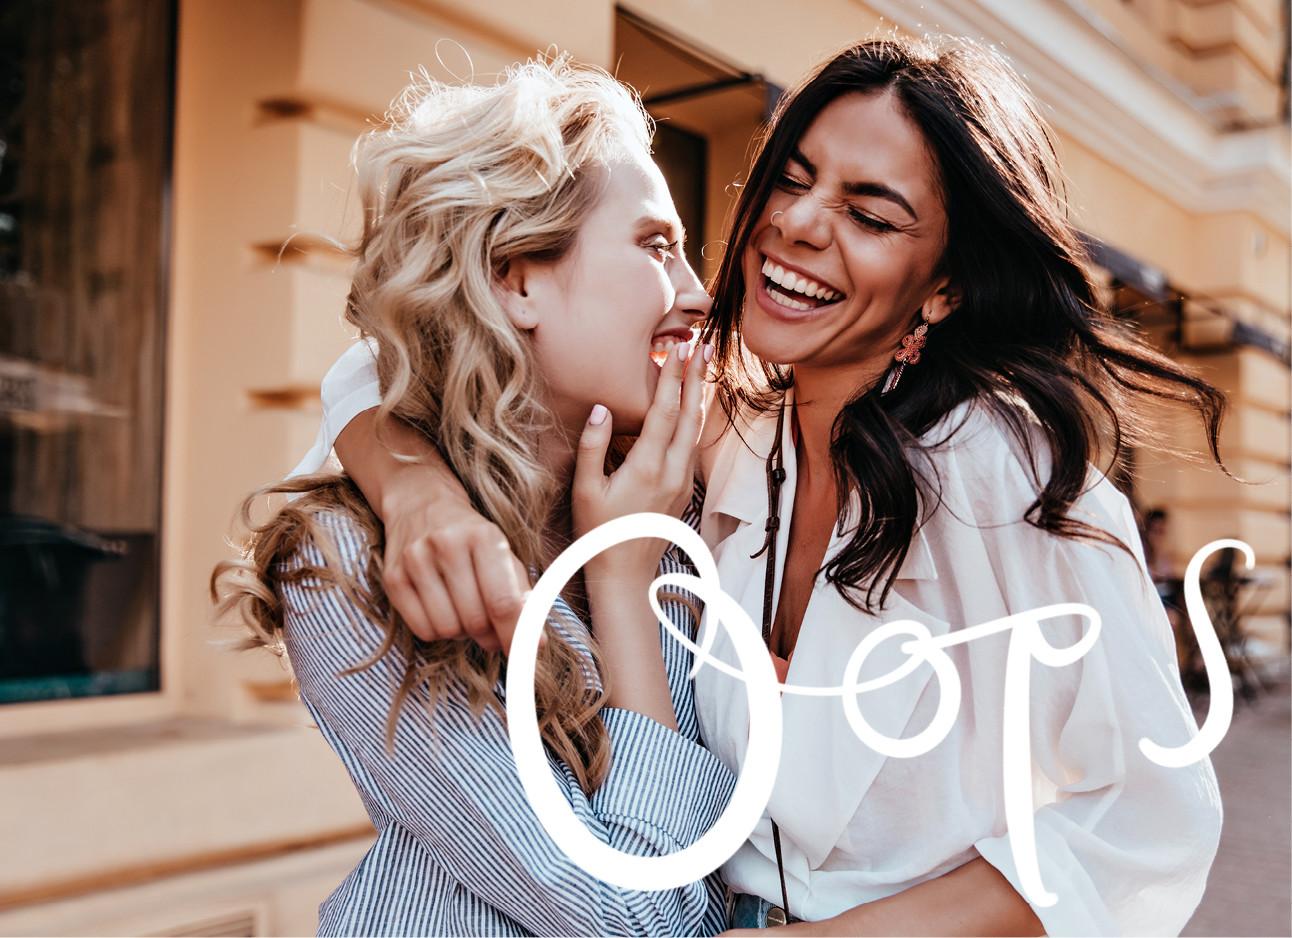 twee vrouwen lachend met elkaar op straat